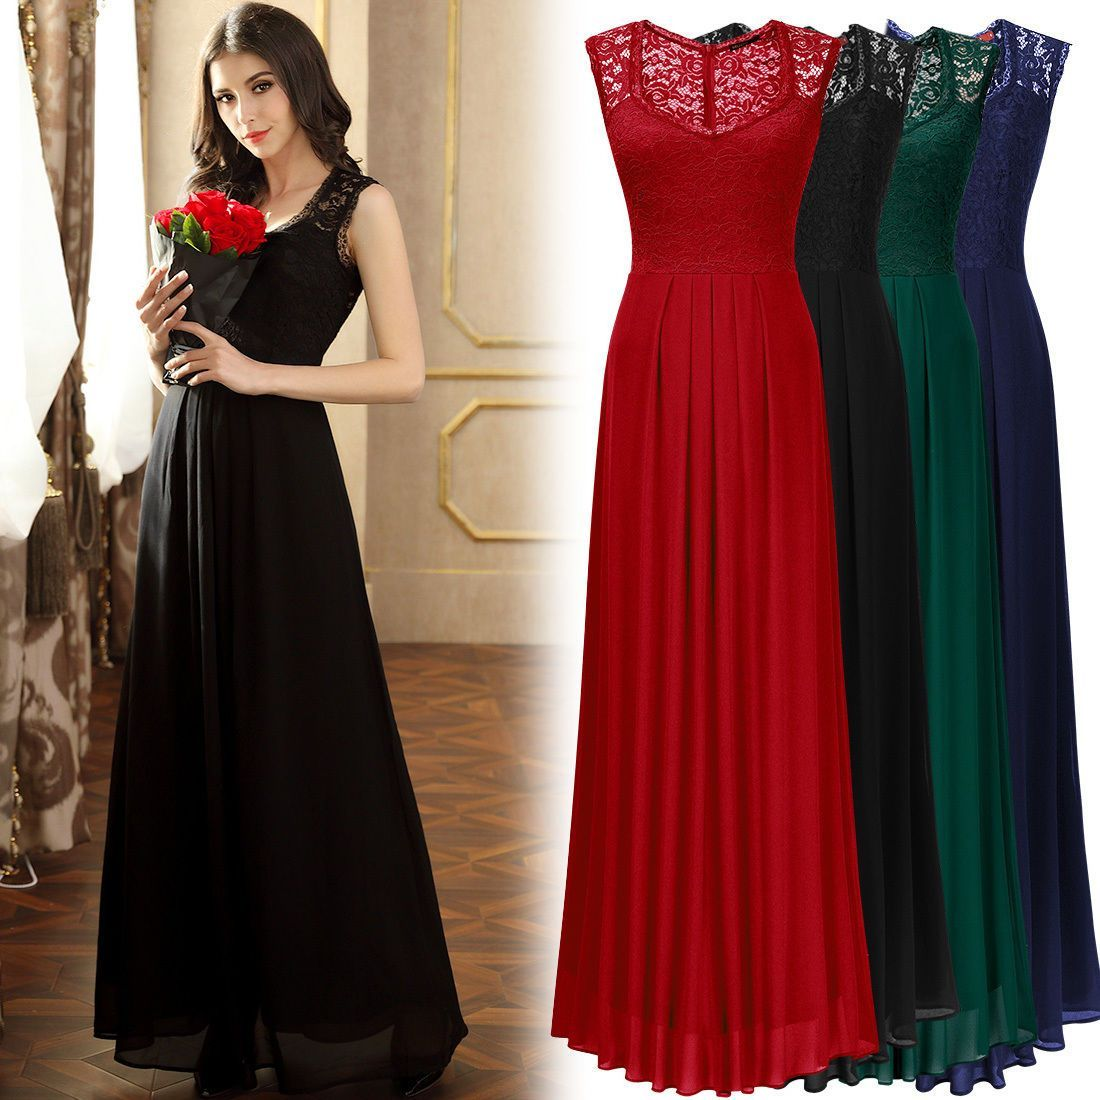 c413df1ebe63 Womens Long Chiffon Lace Formal Evening Prom Party Bridesmaid Wedding Maxi  Dress